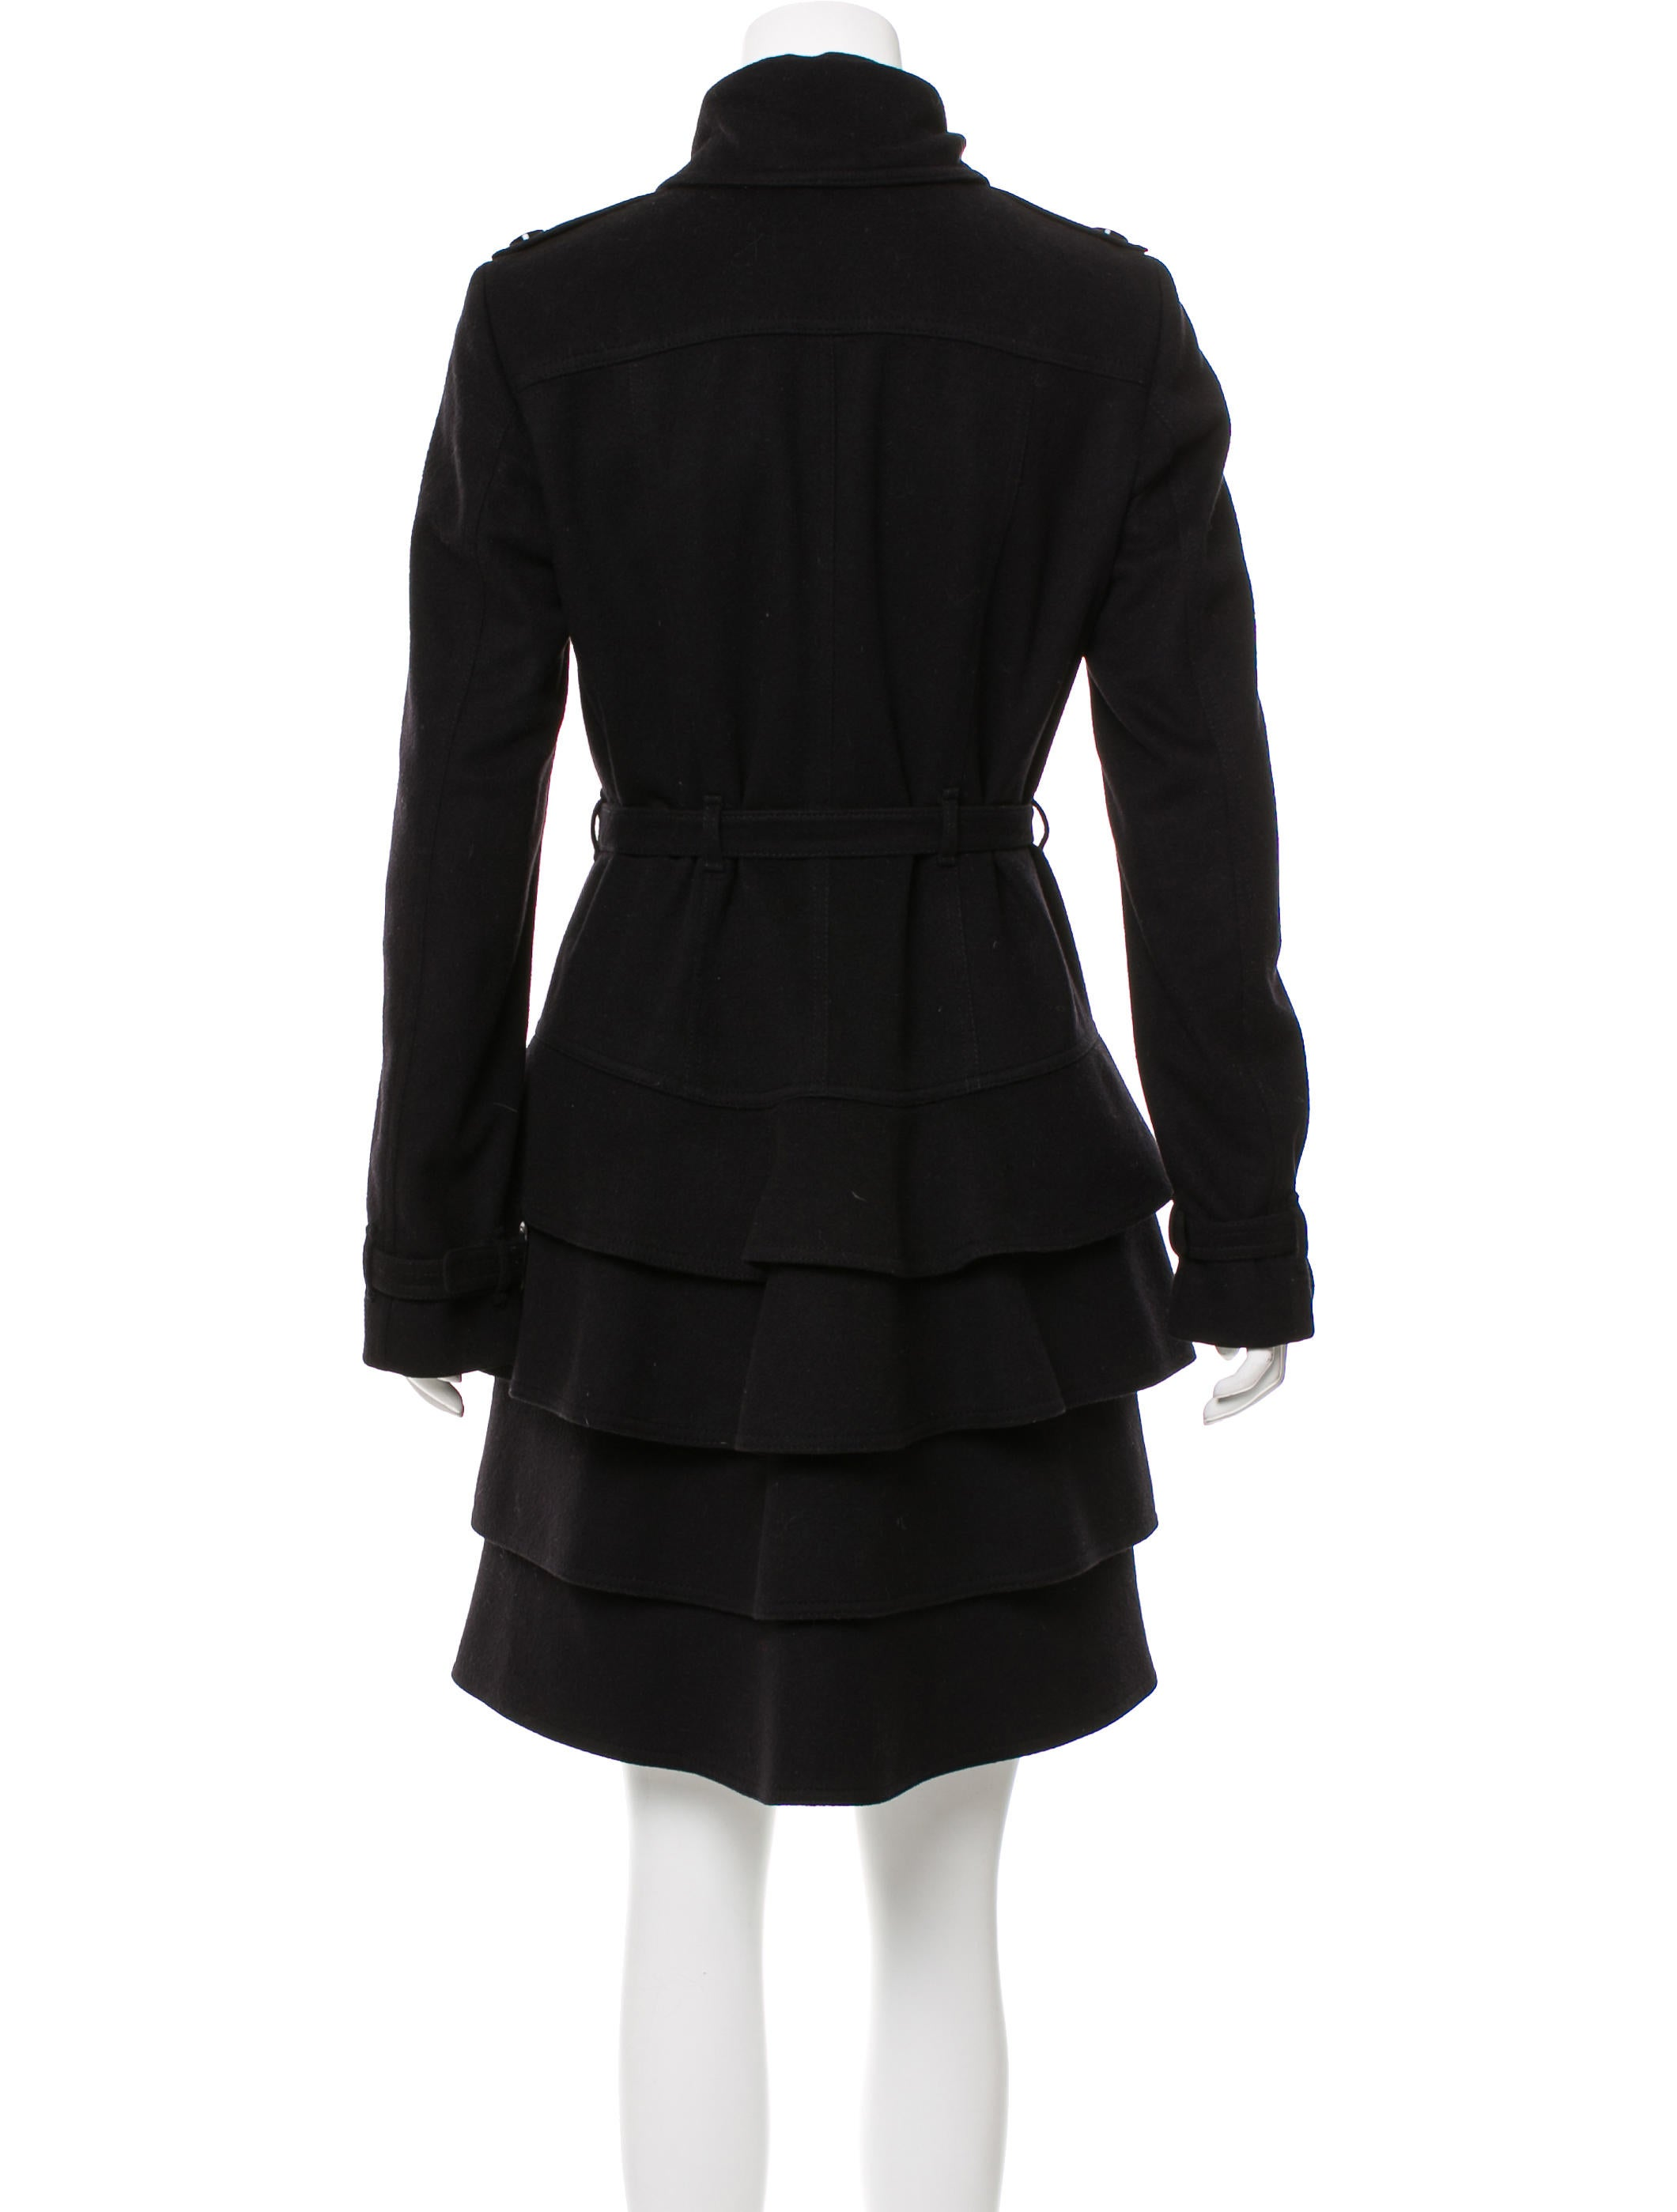 122badbb5feb5 Burberry London Belted Wool Coat - Clothing - WBURL28706